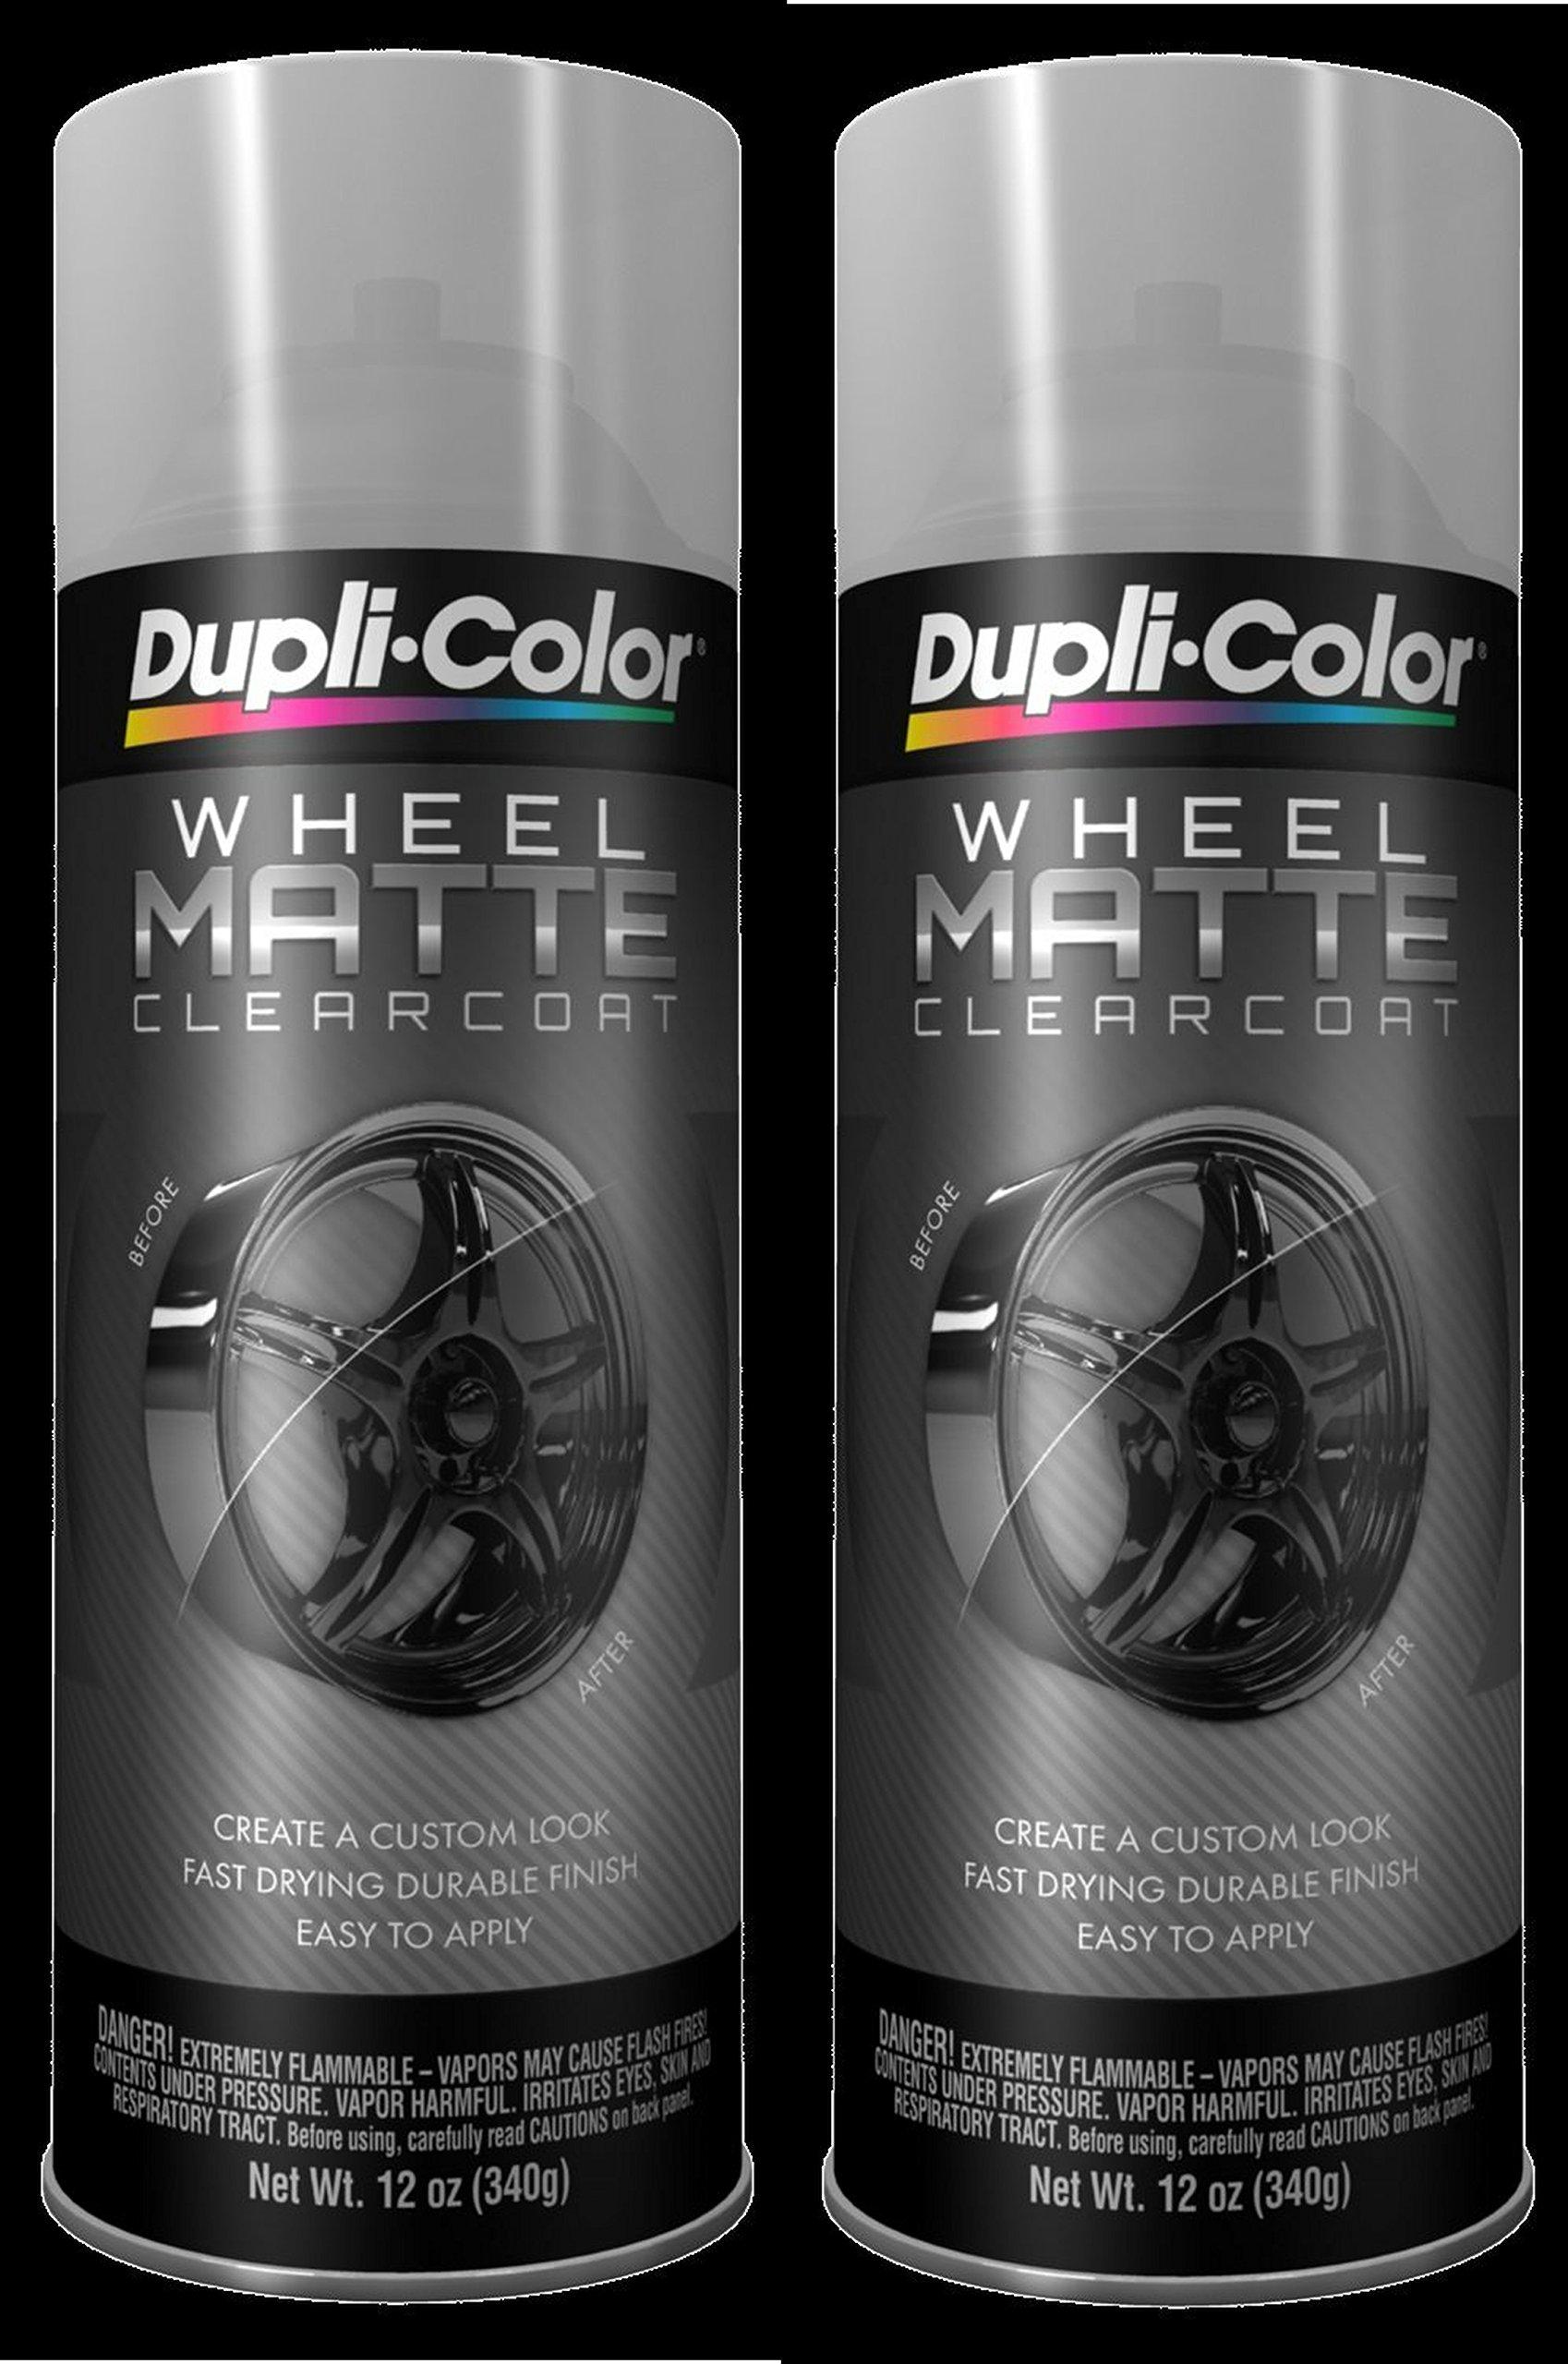 Dupli Color Hwp106 Matte Clearcoat High Performance Wheel